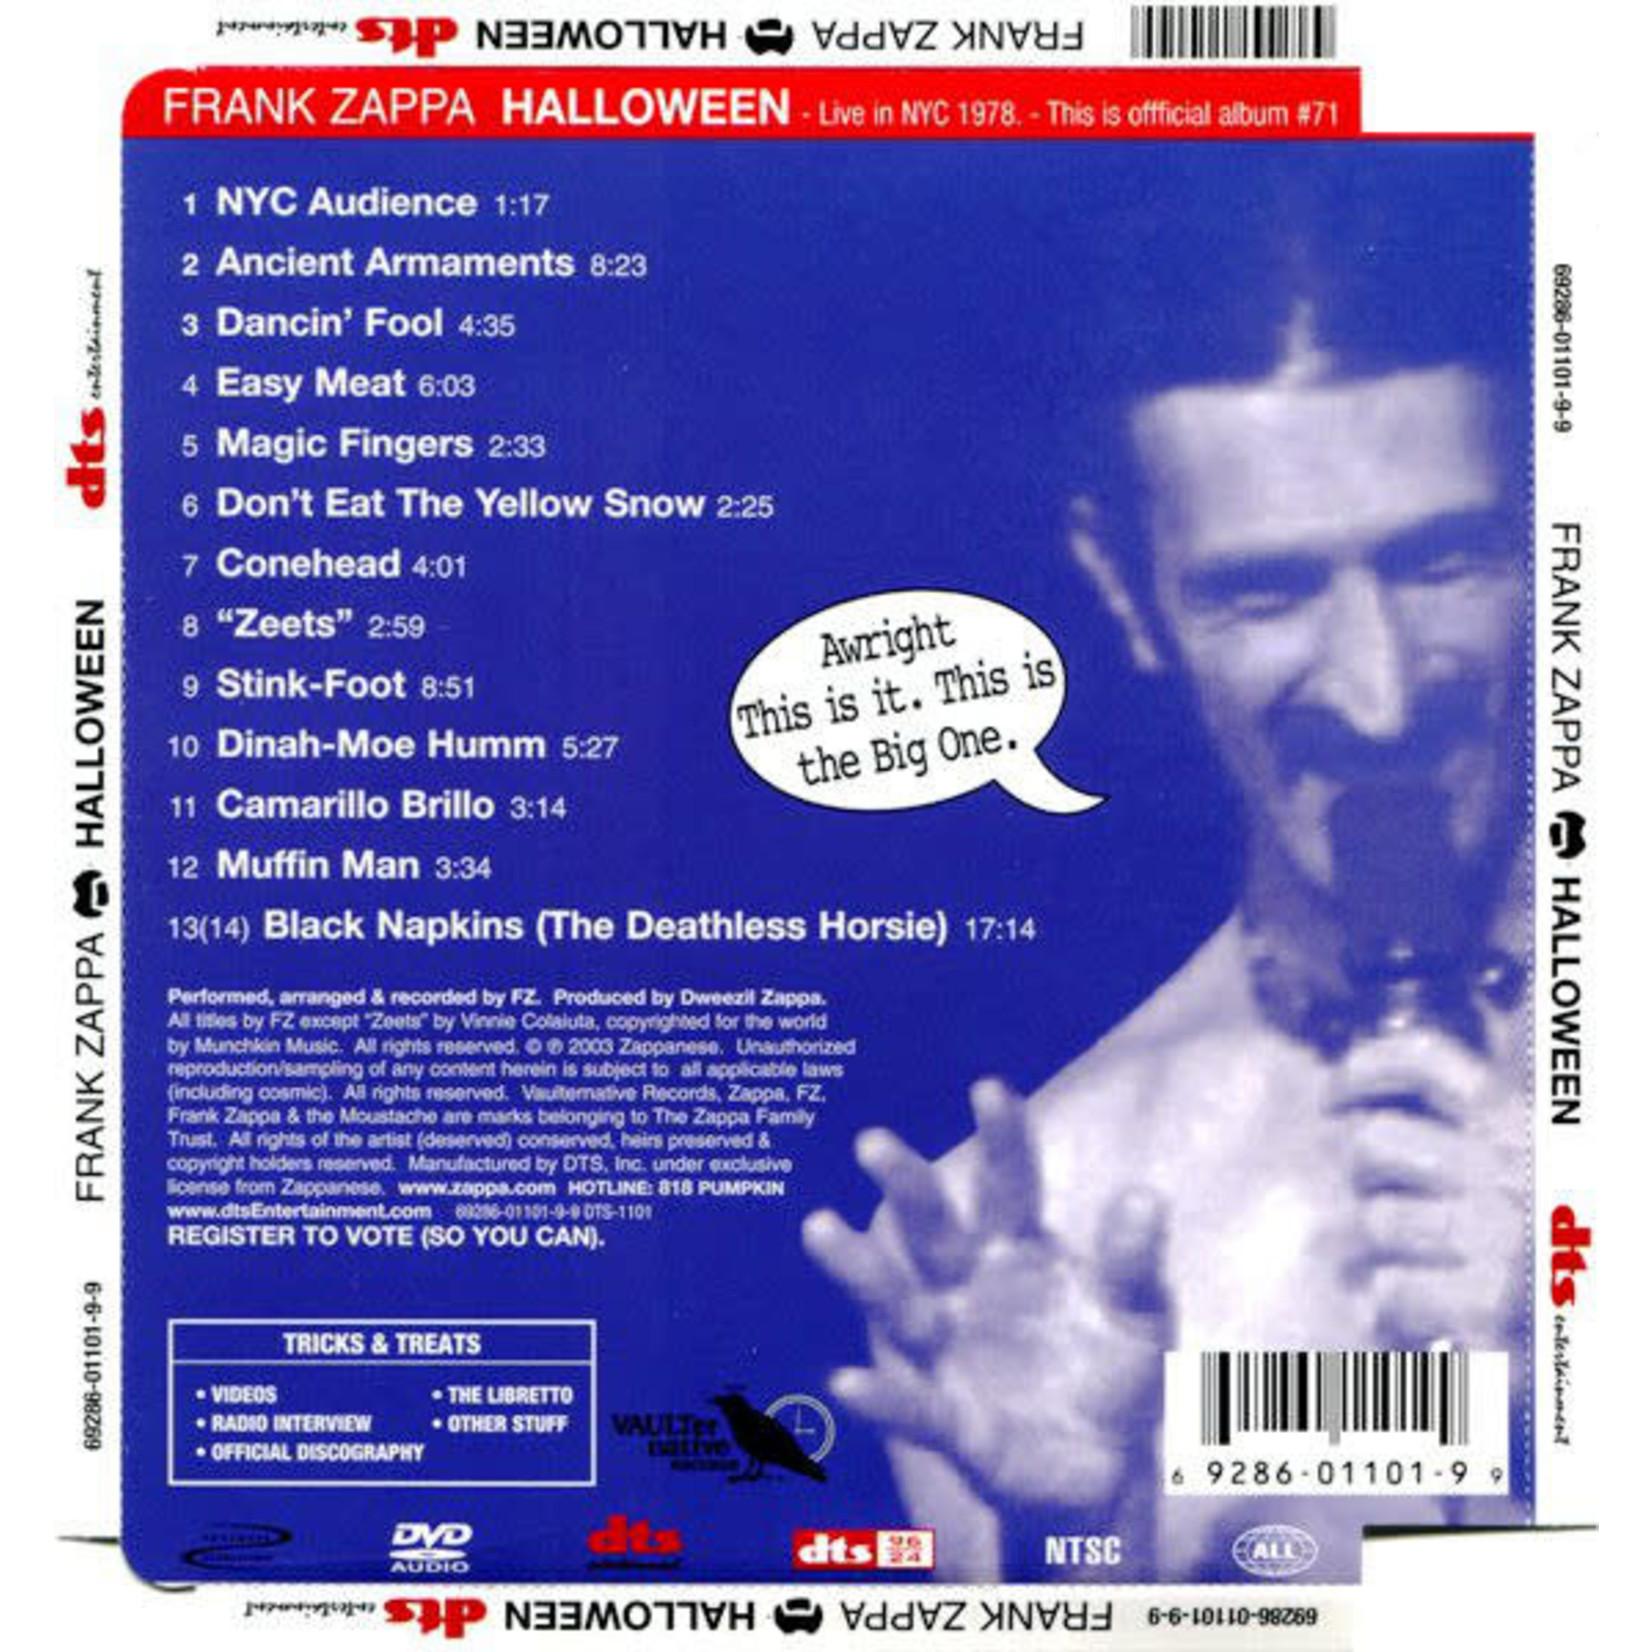 Compact Disc Frank Zappa - Halloween (Used)